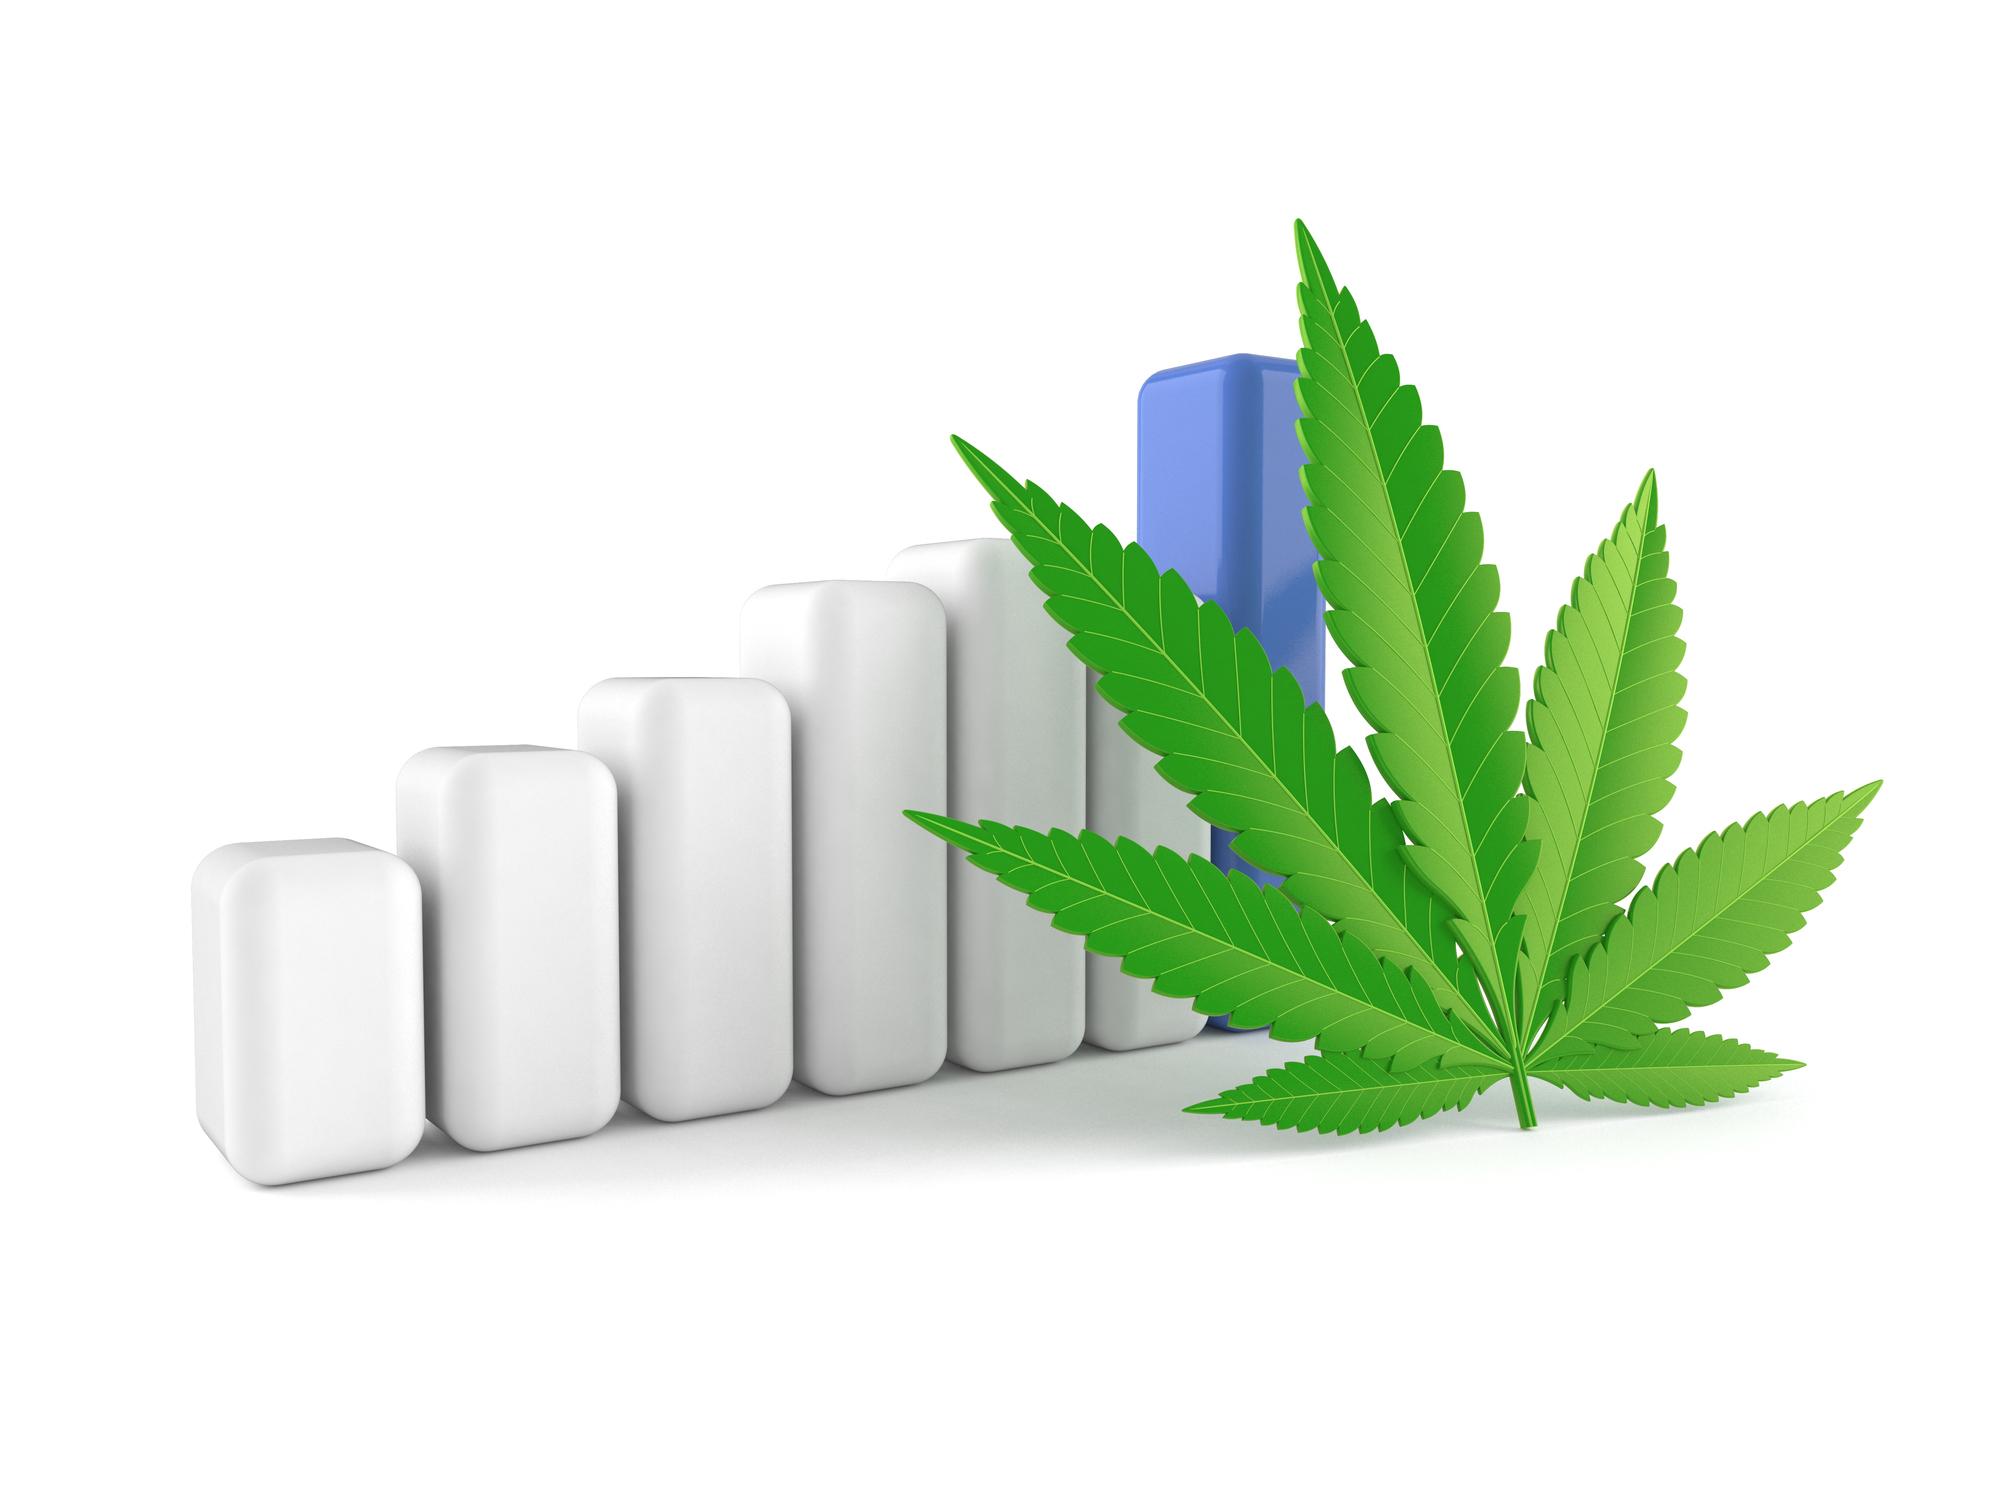 Marijuana leaf next to a 3D bar chart